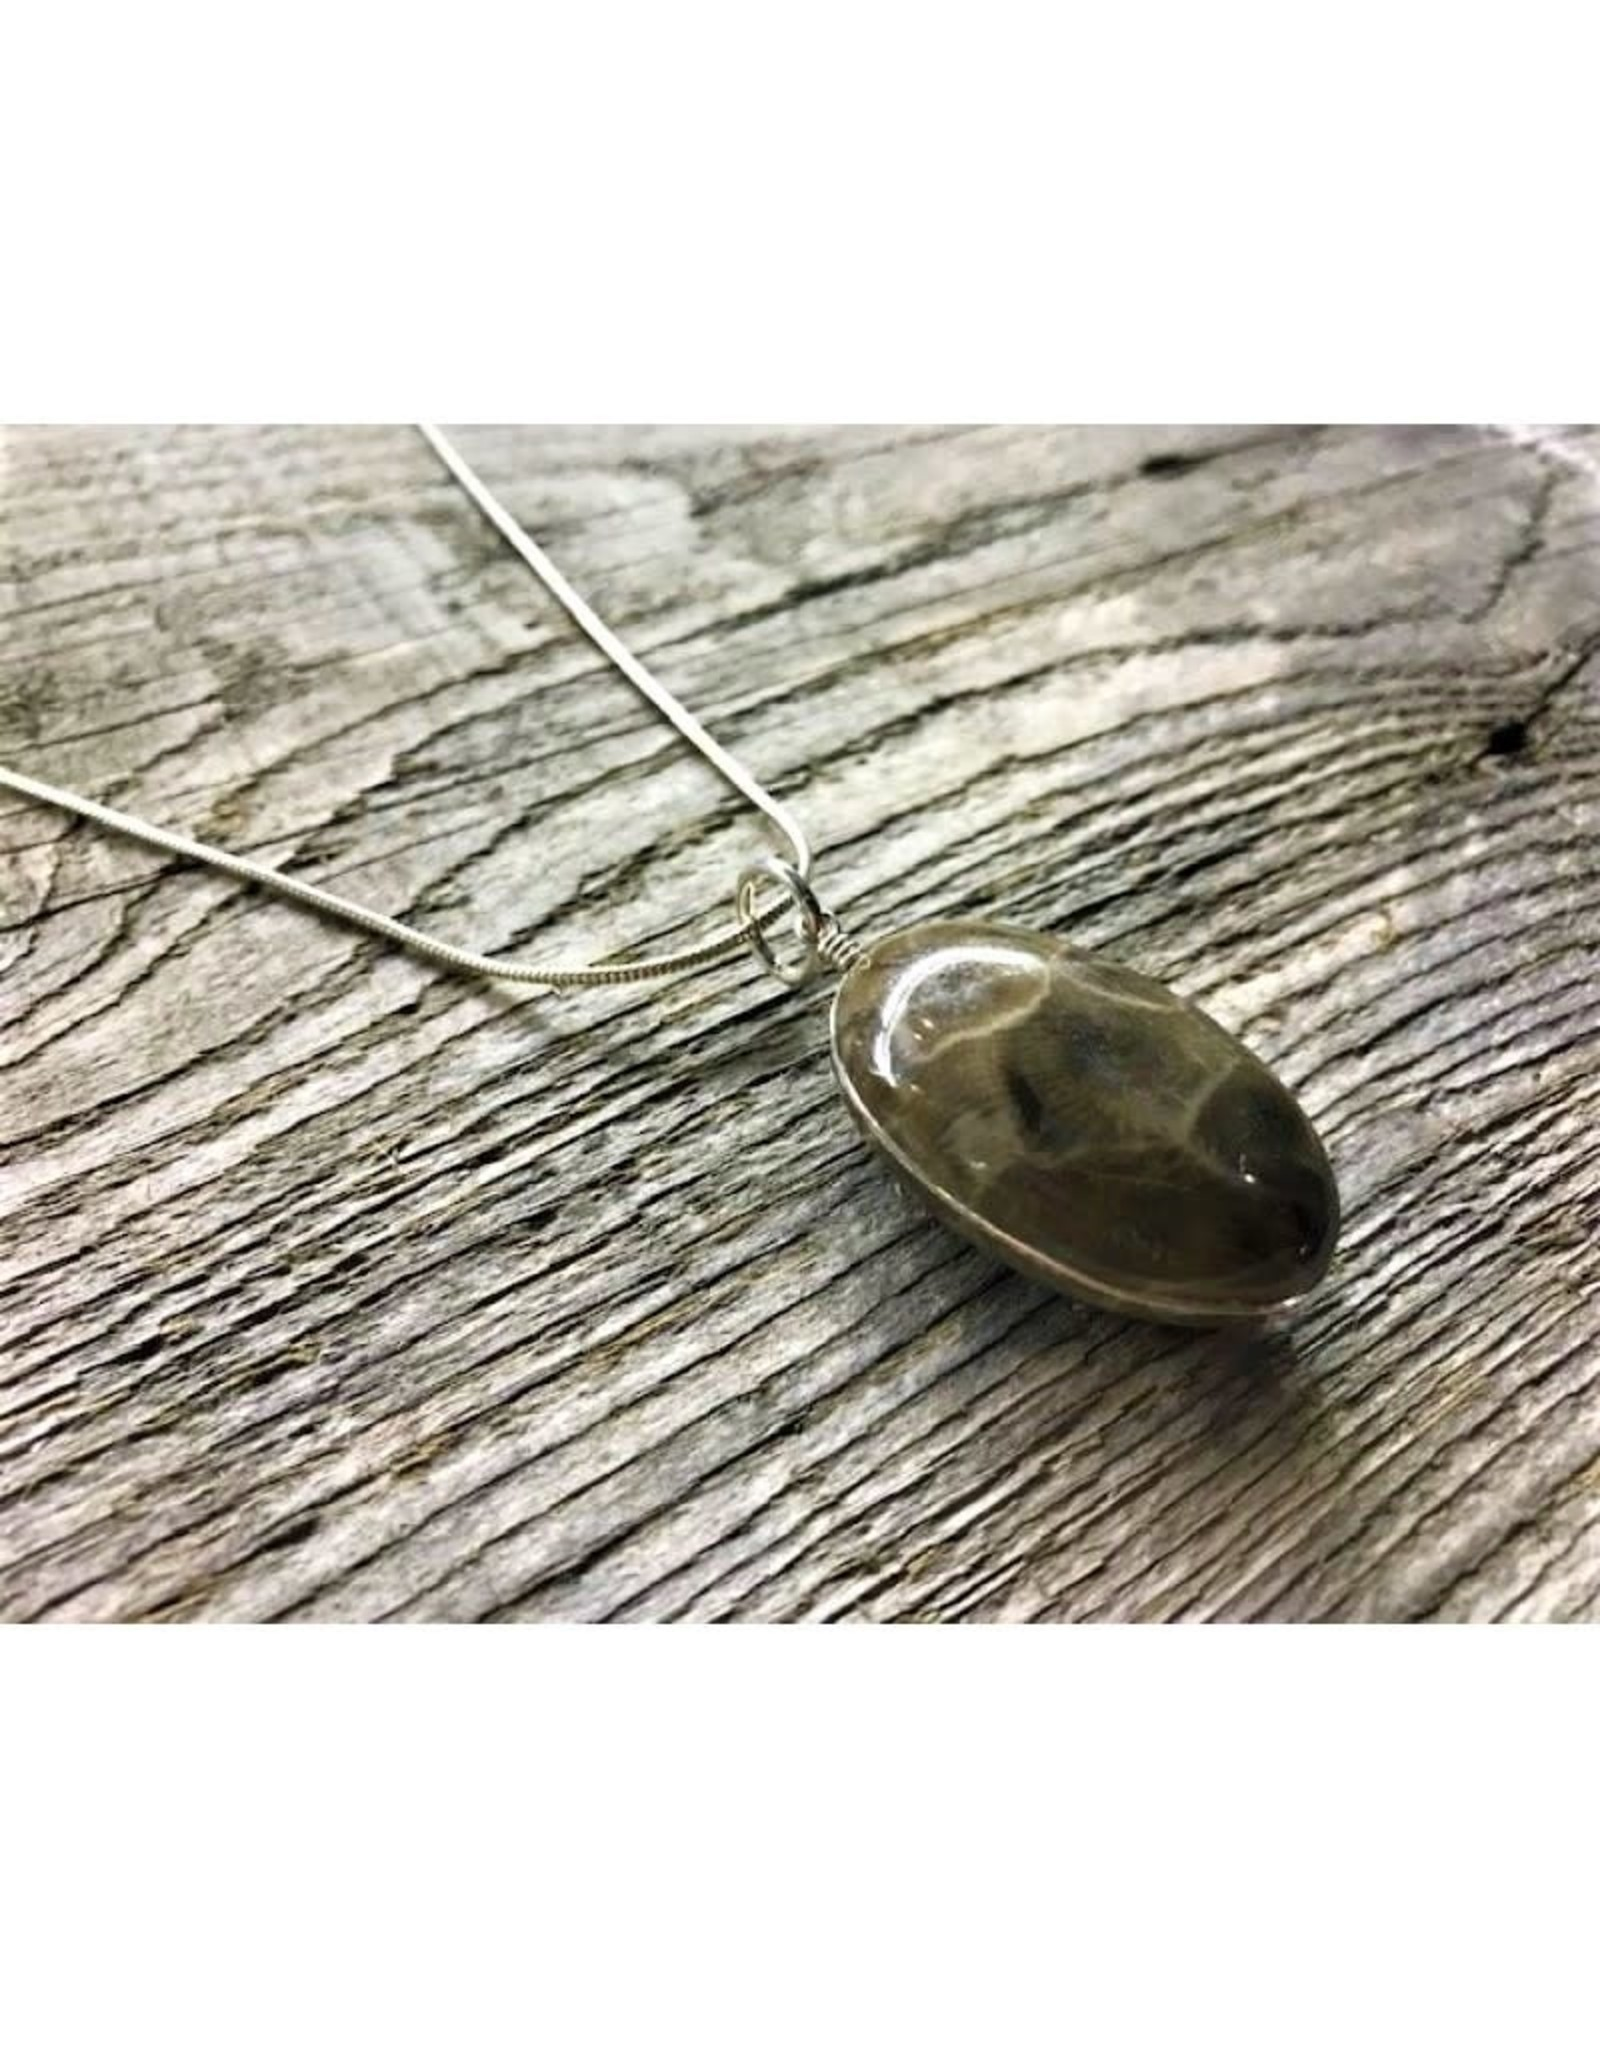 Necklace Pendant - Petoskey Stone